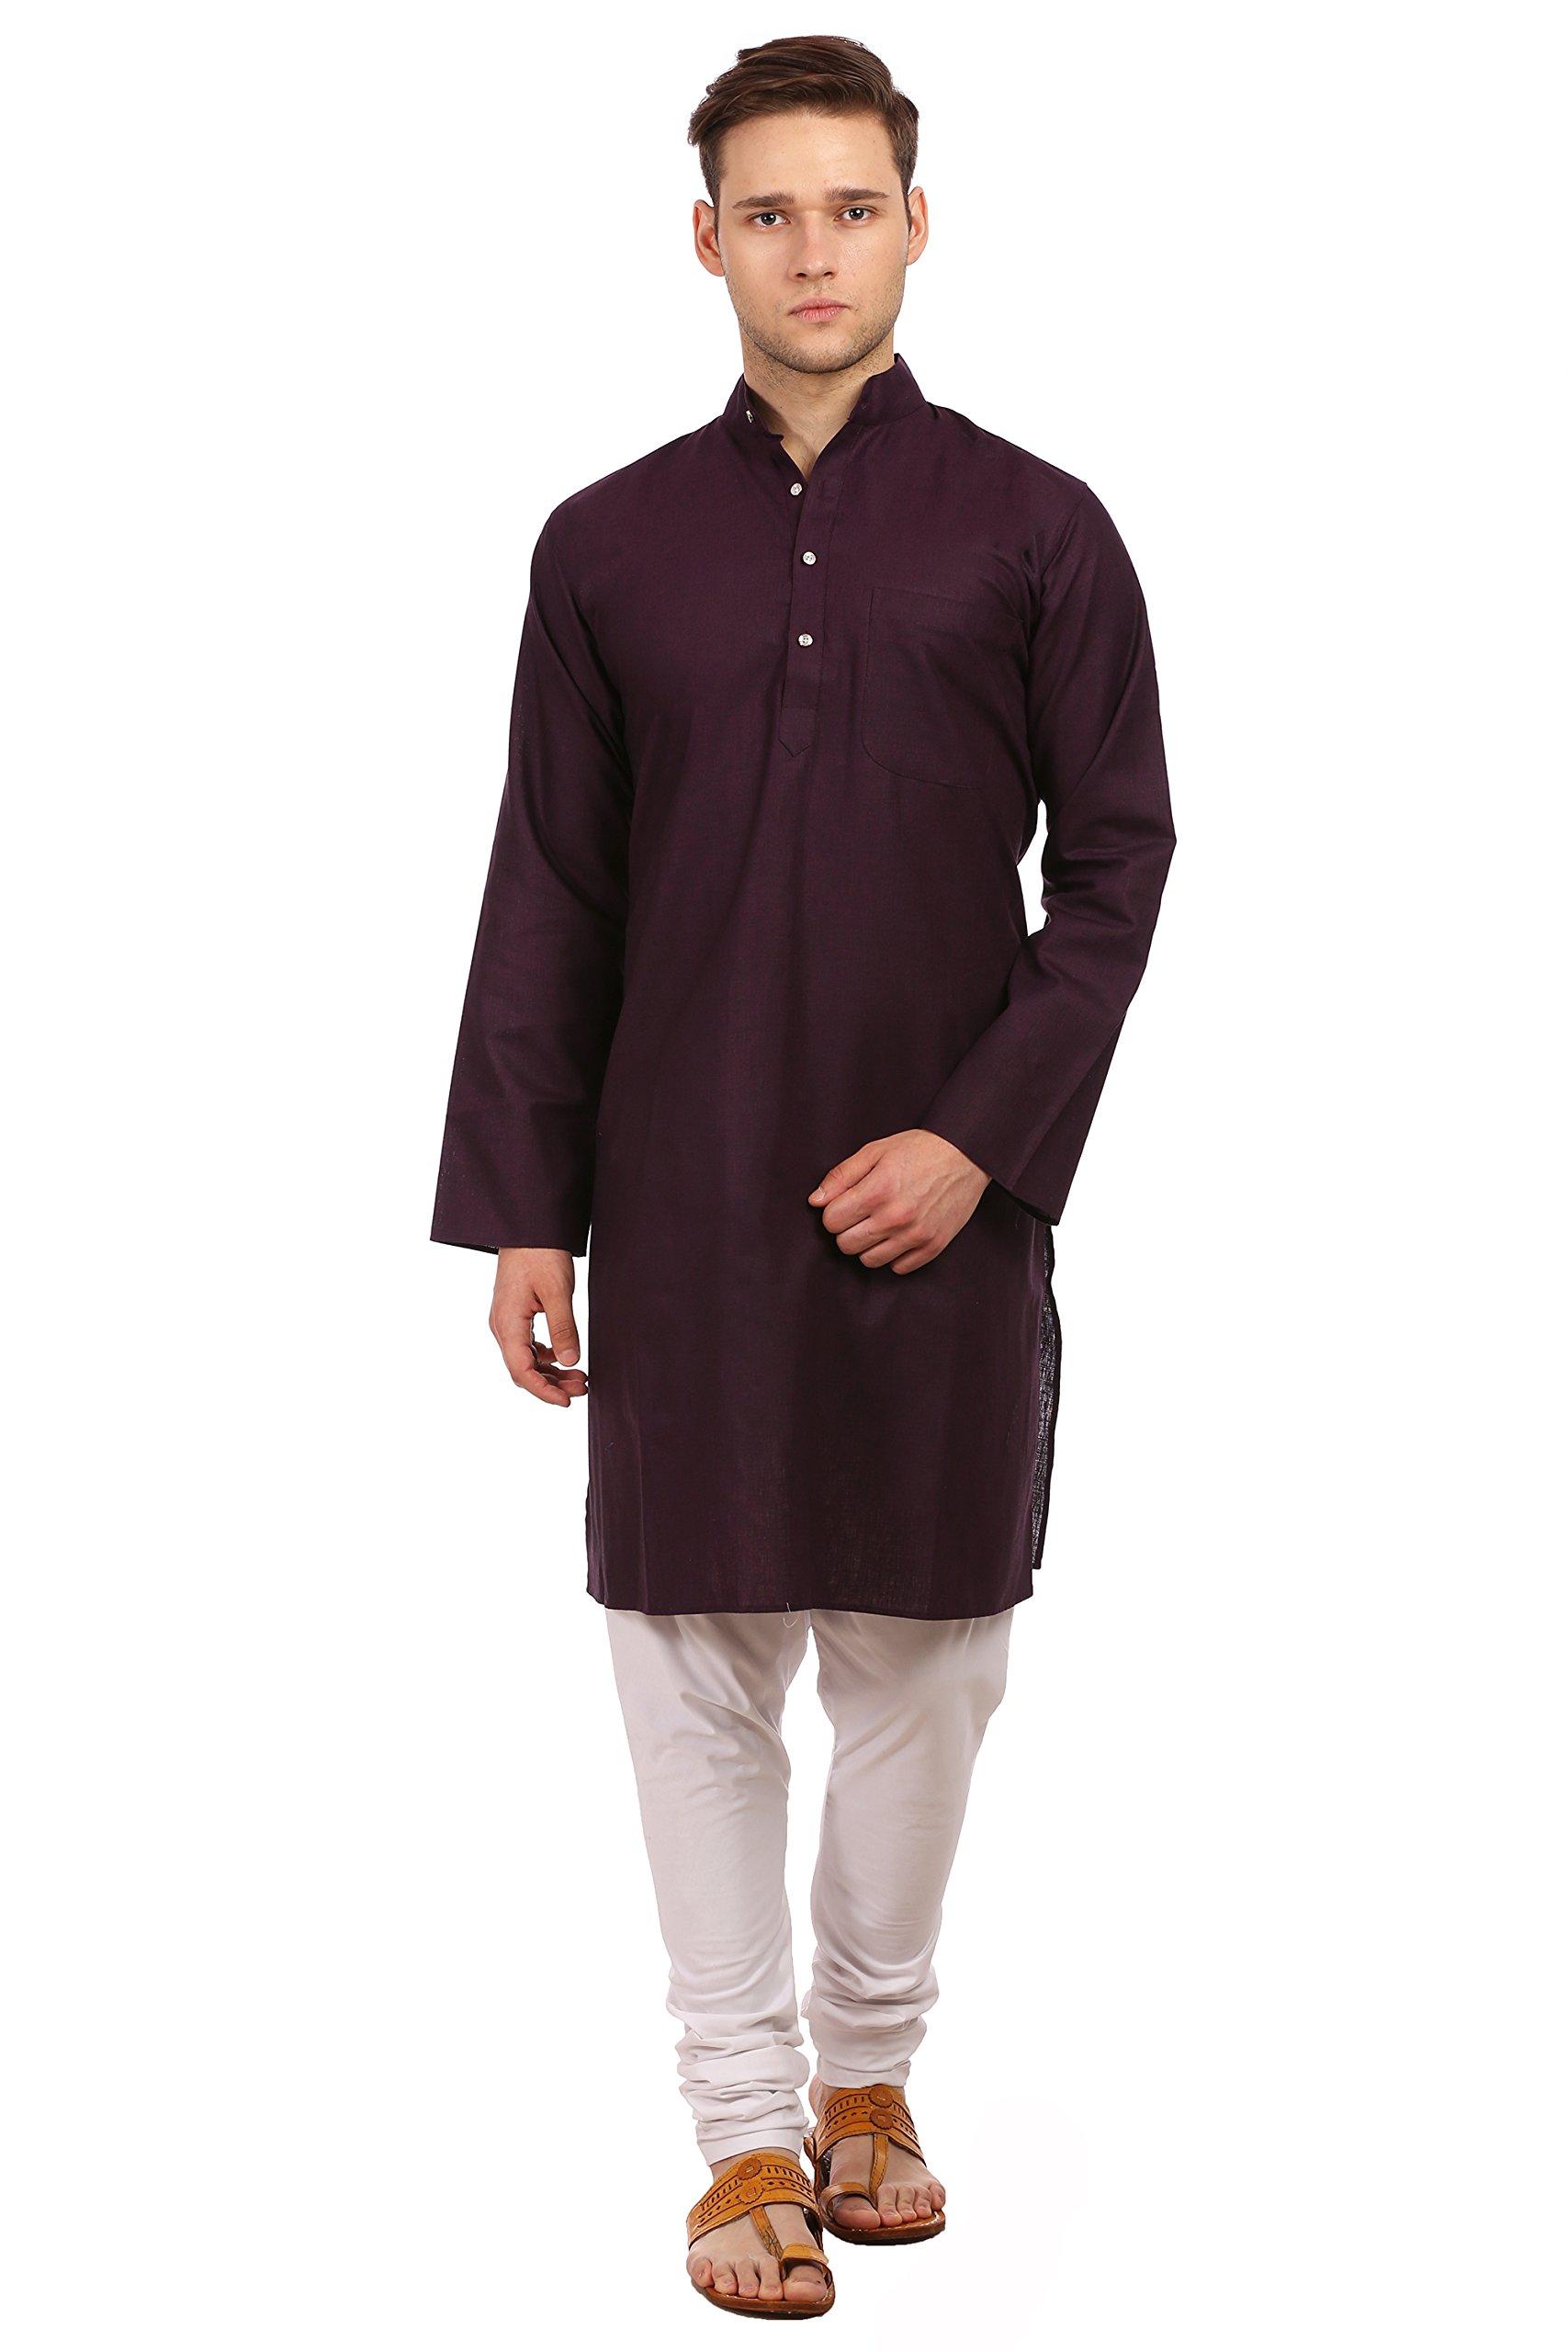 WINTAGE Men's Cotton Polyester Festive and Casual Purple Kurta Pyjama